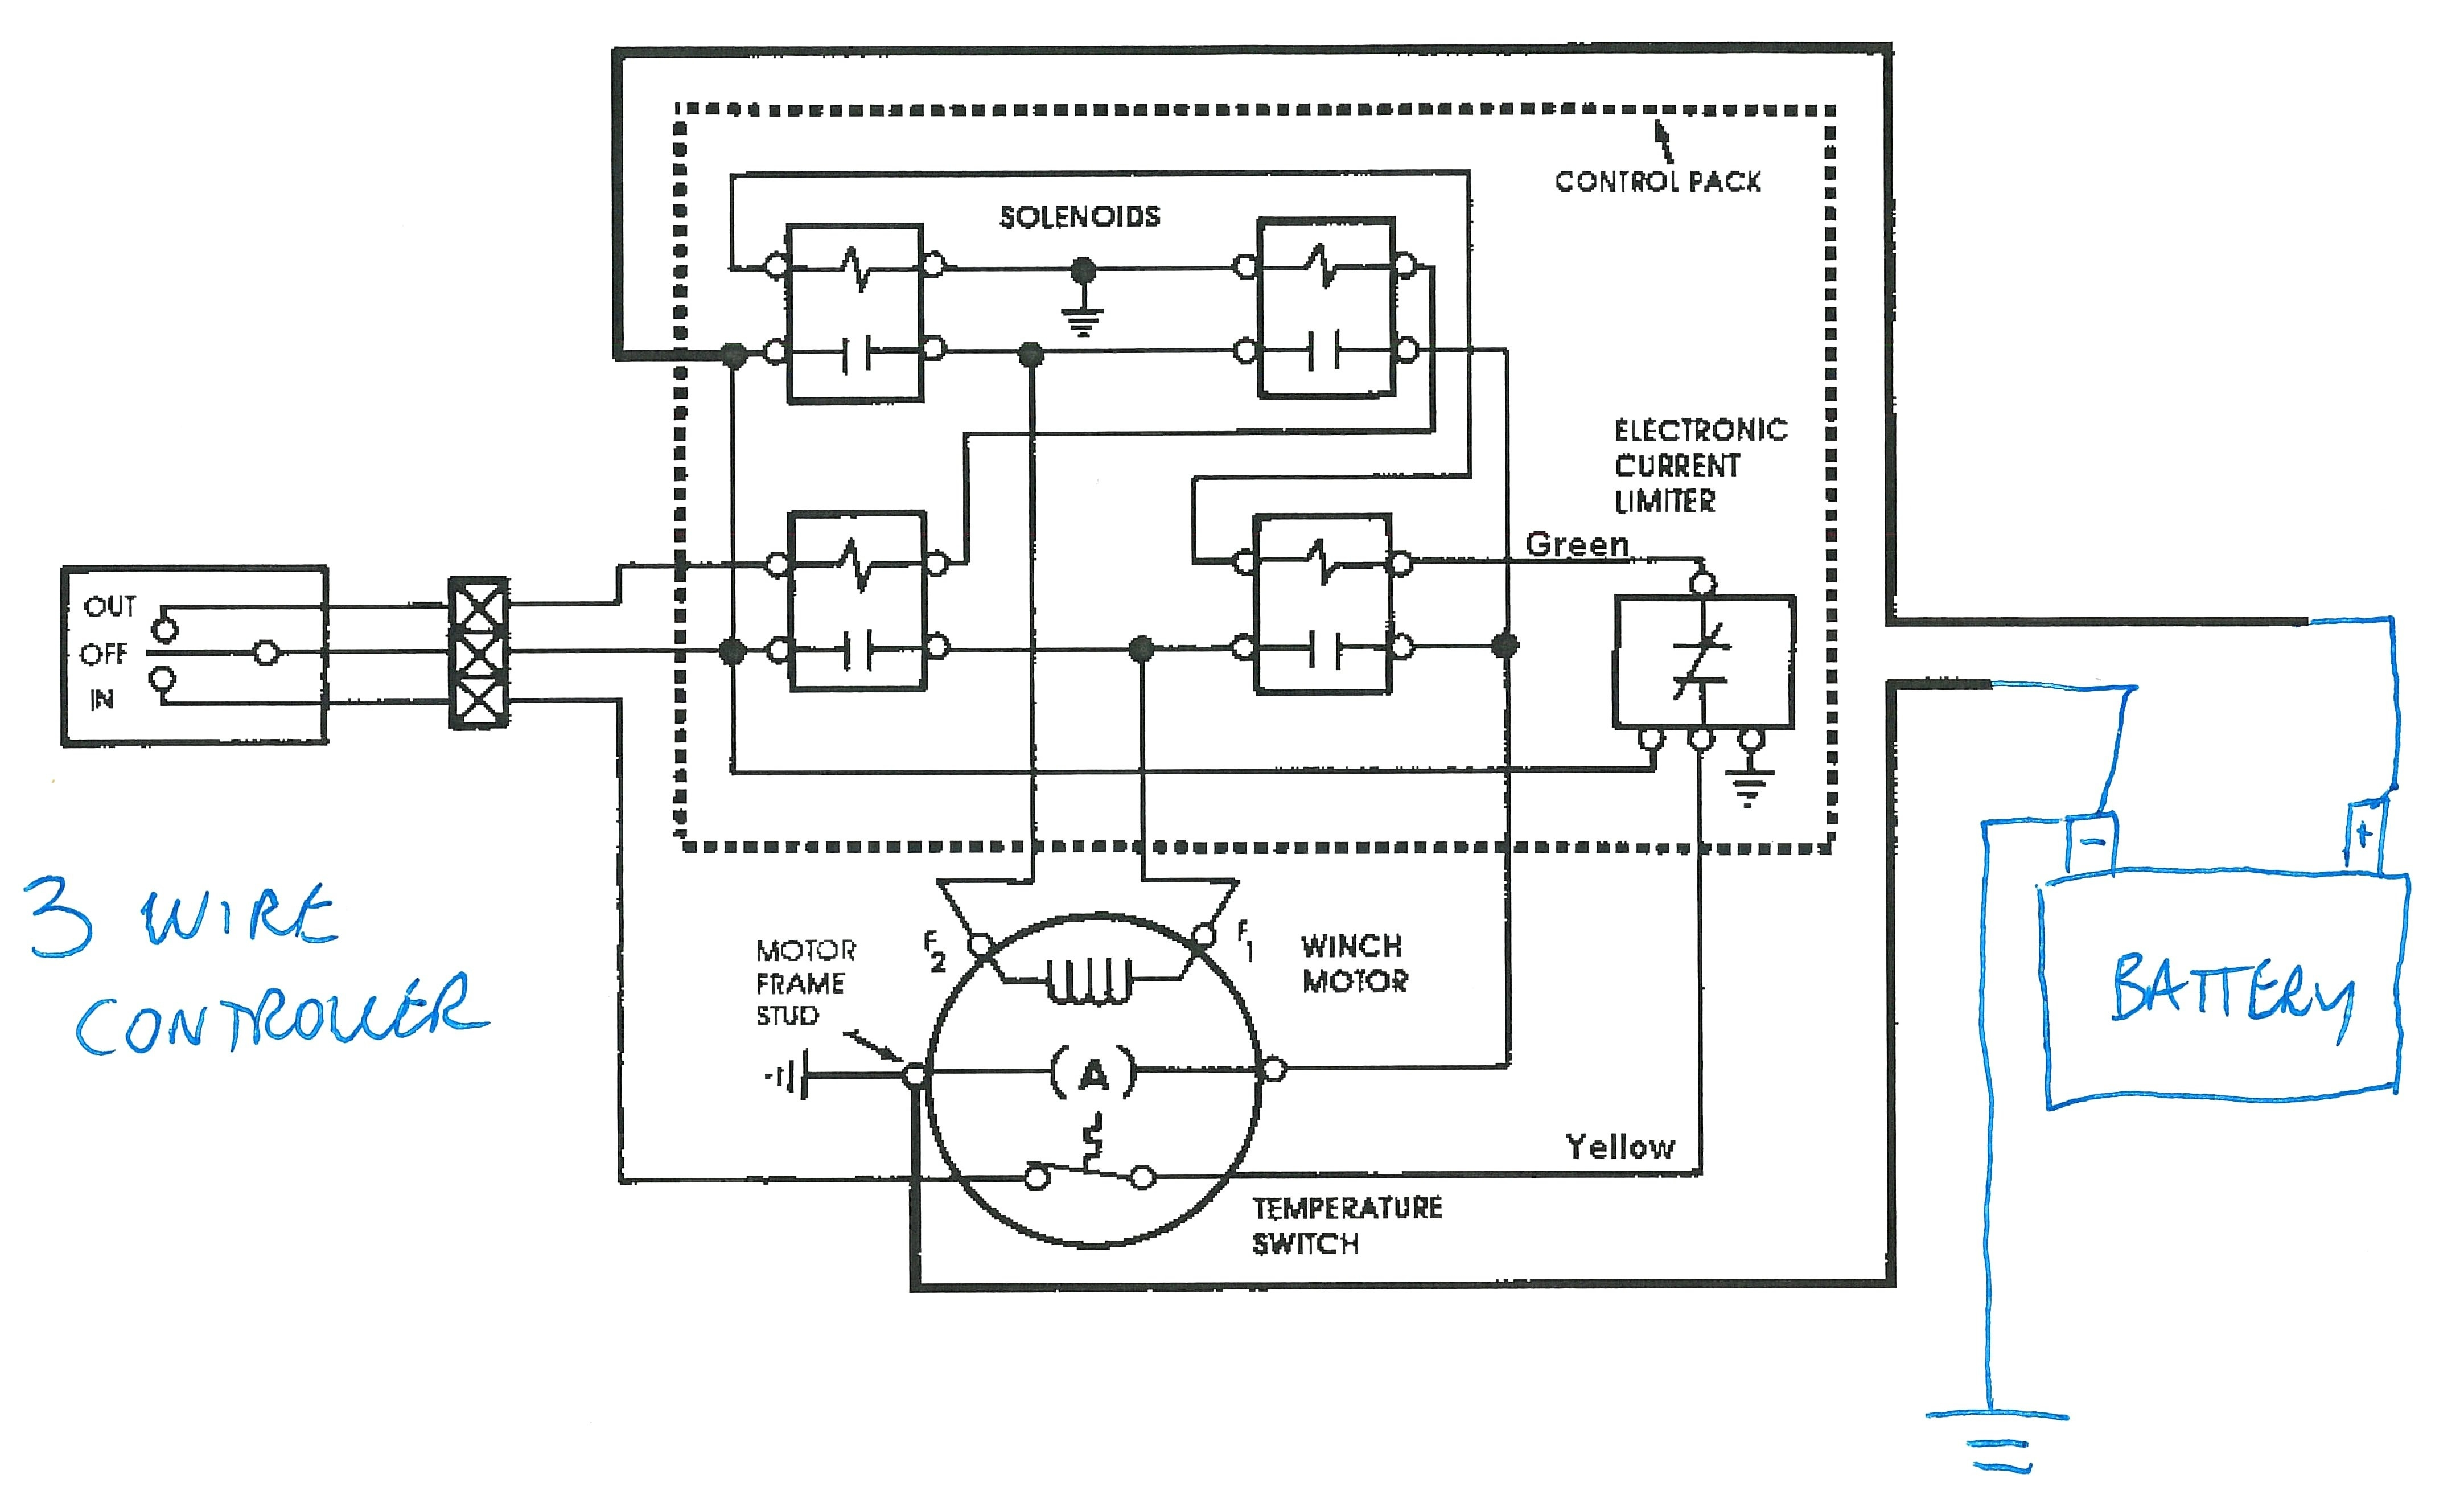 atv winch wiring diagram Collection-Wiring Diagram Winch Solenoid Reference Best Warn Winch Solenoid Wiring Diagram Atv 14-e